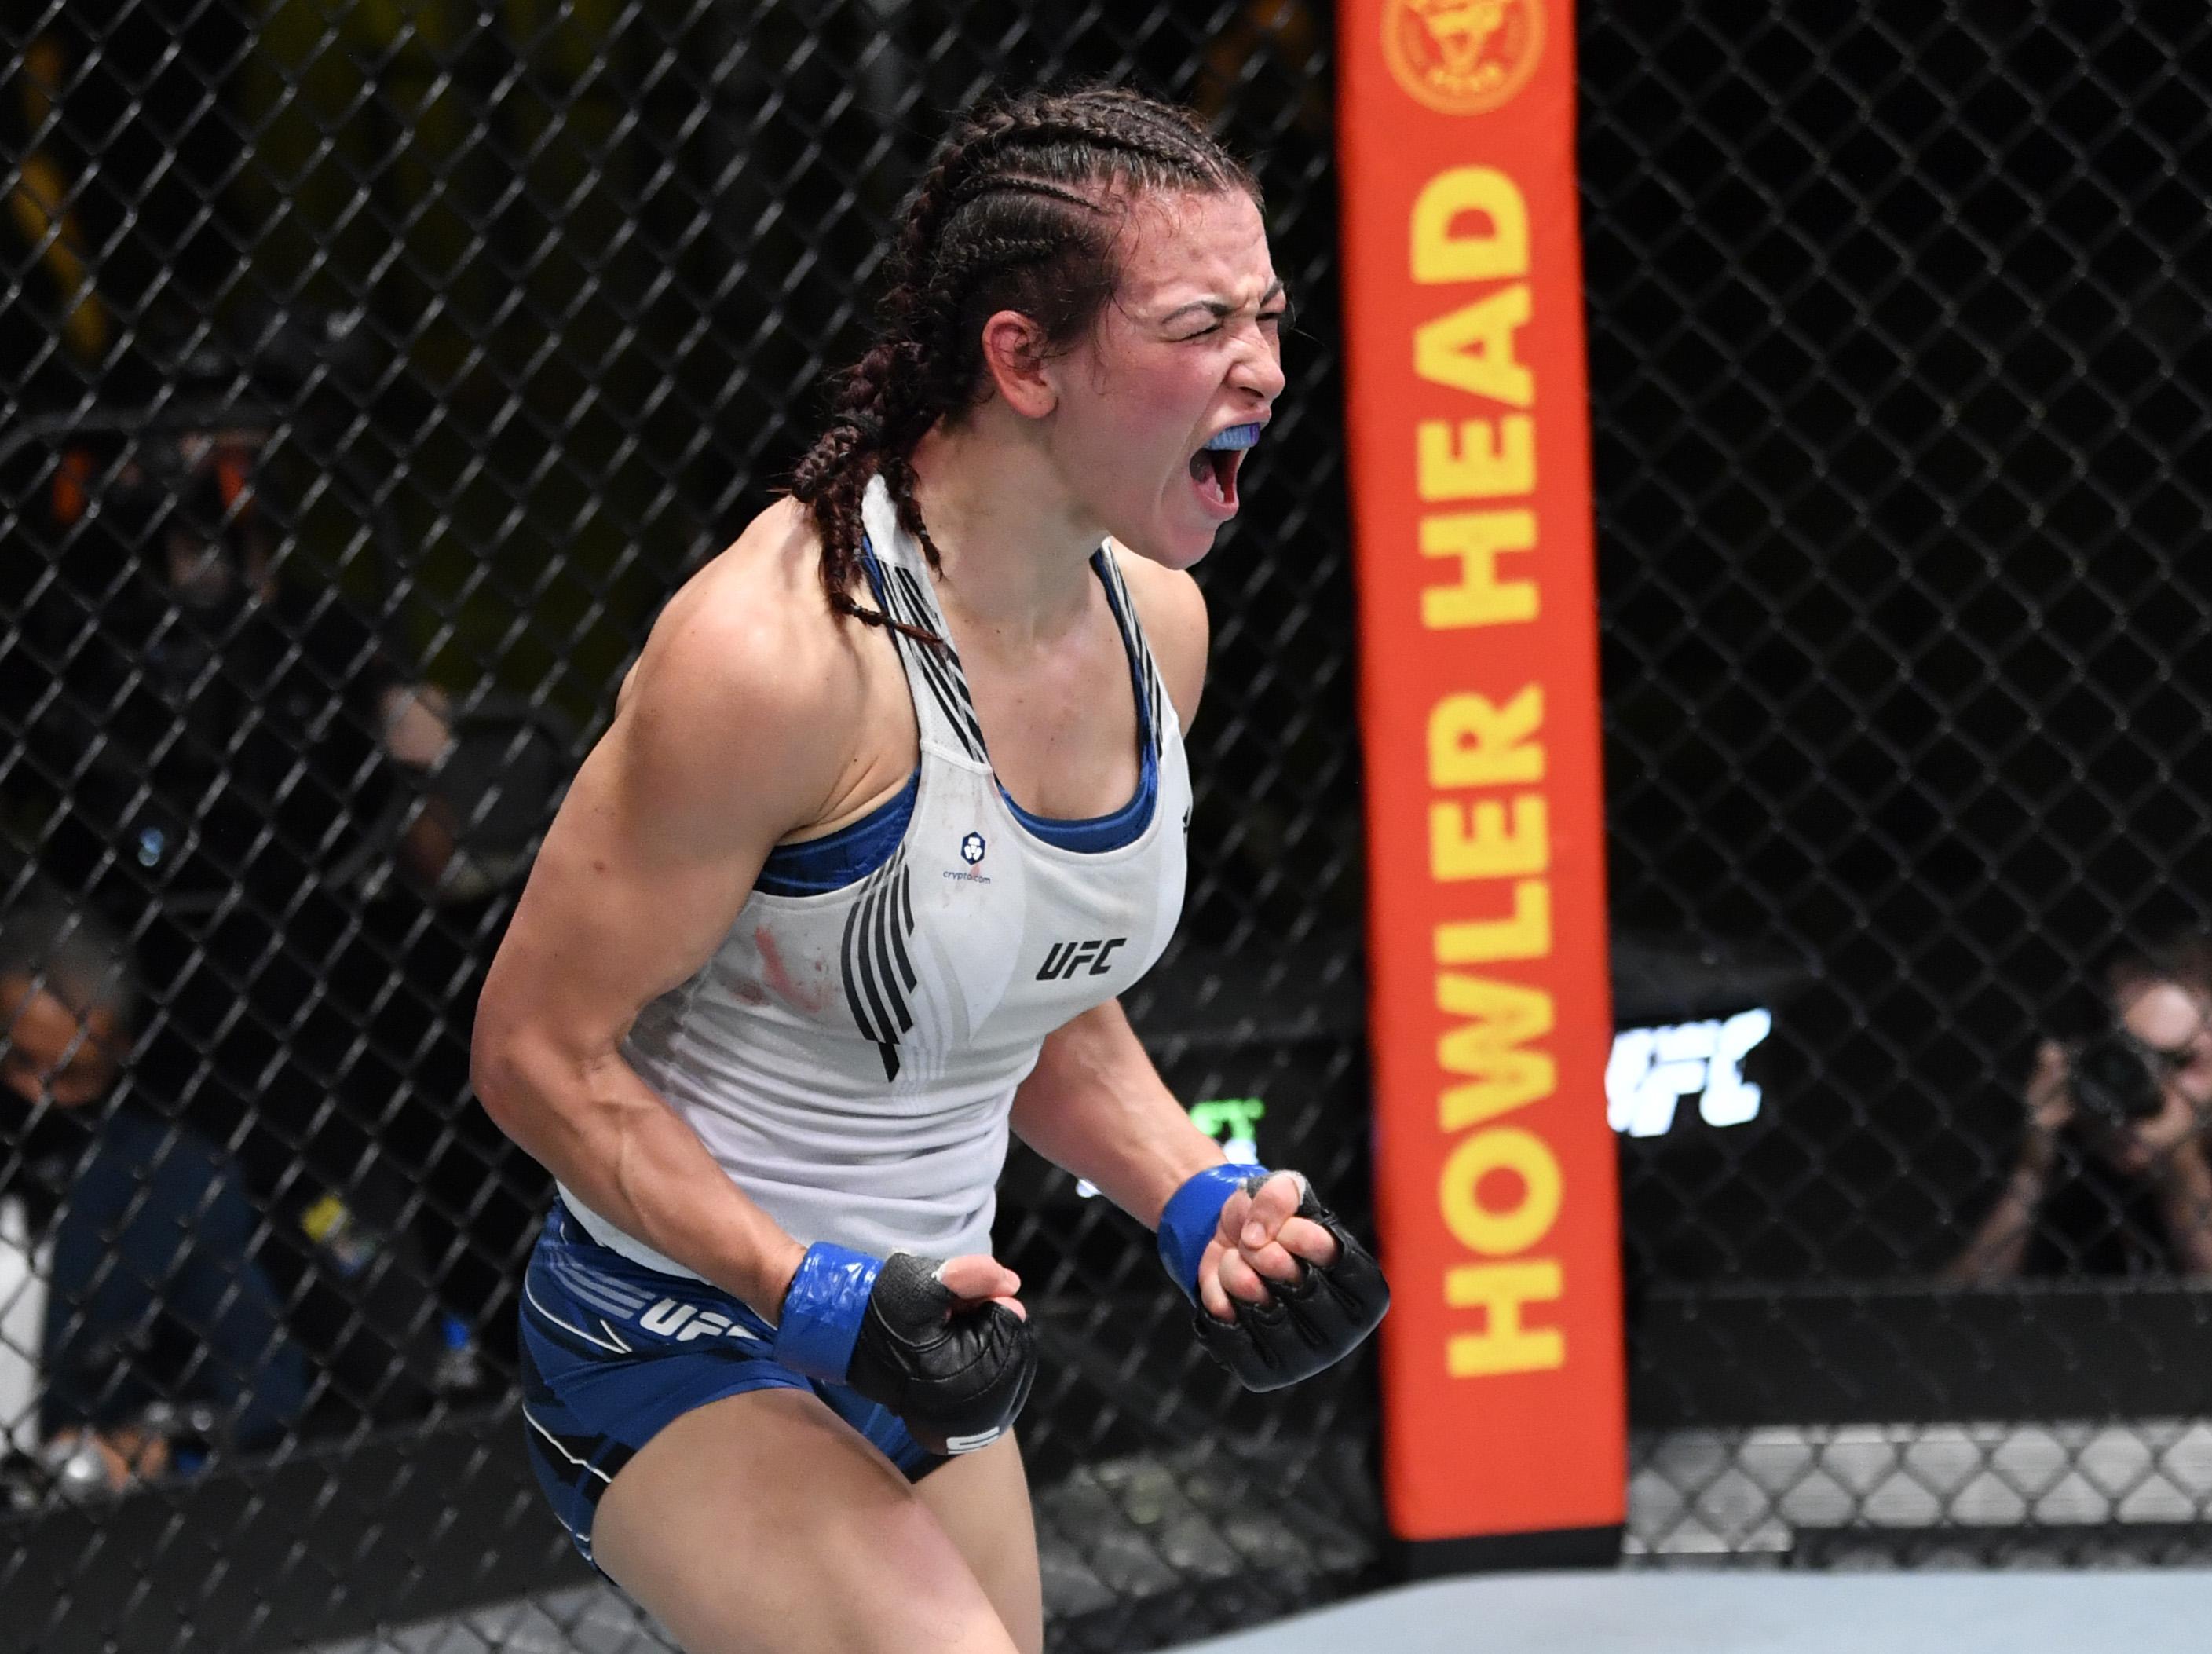 UFC Fight Night: Reneau v Tate